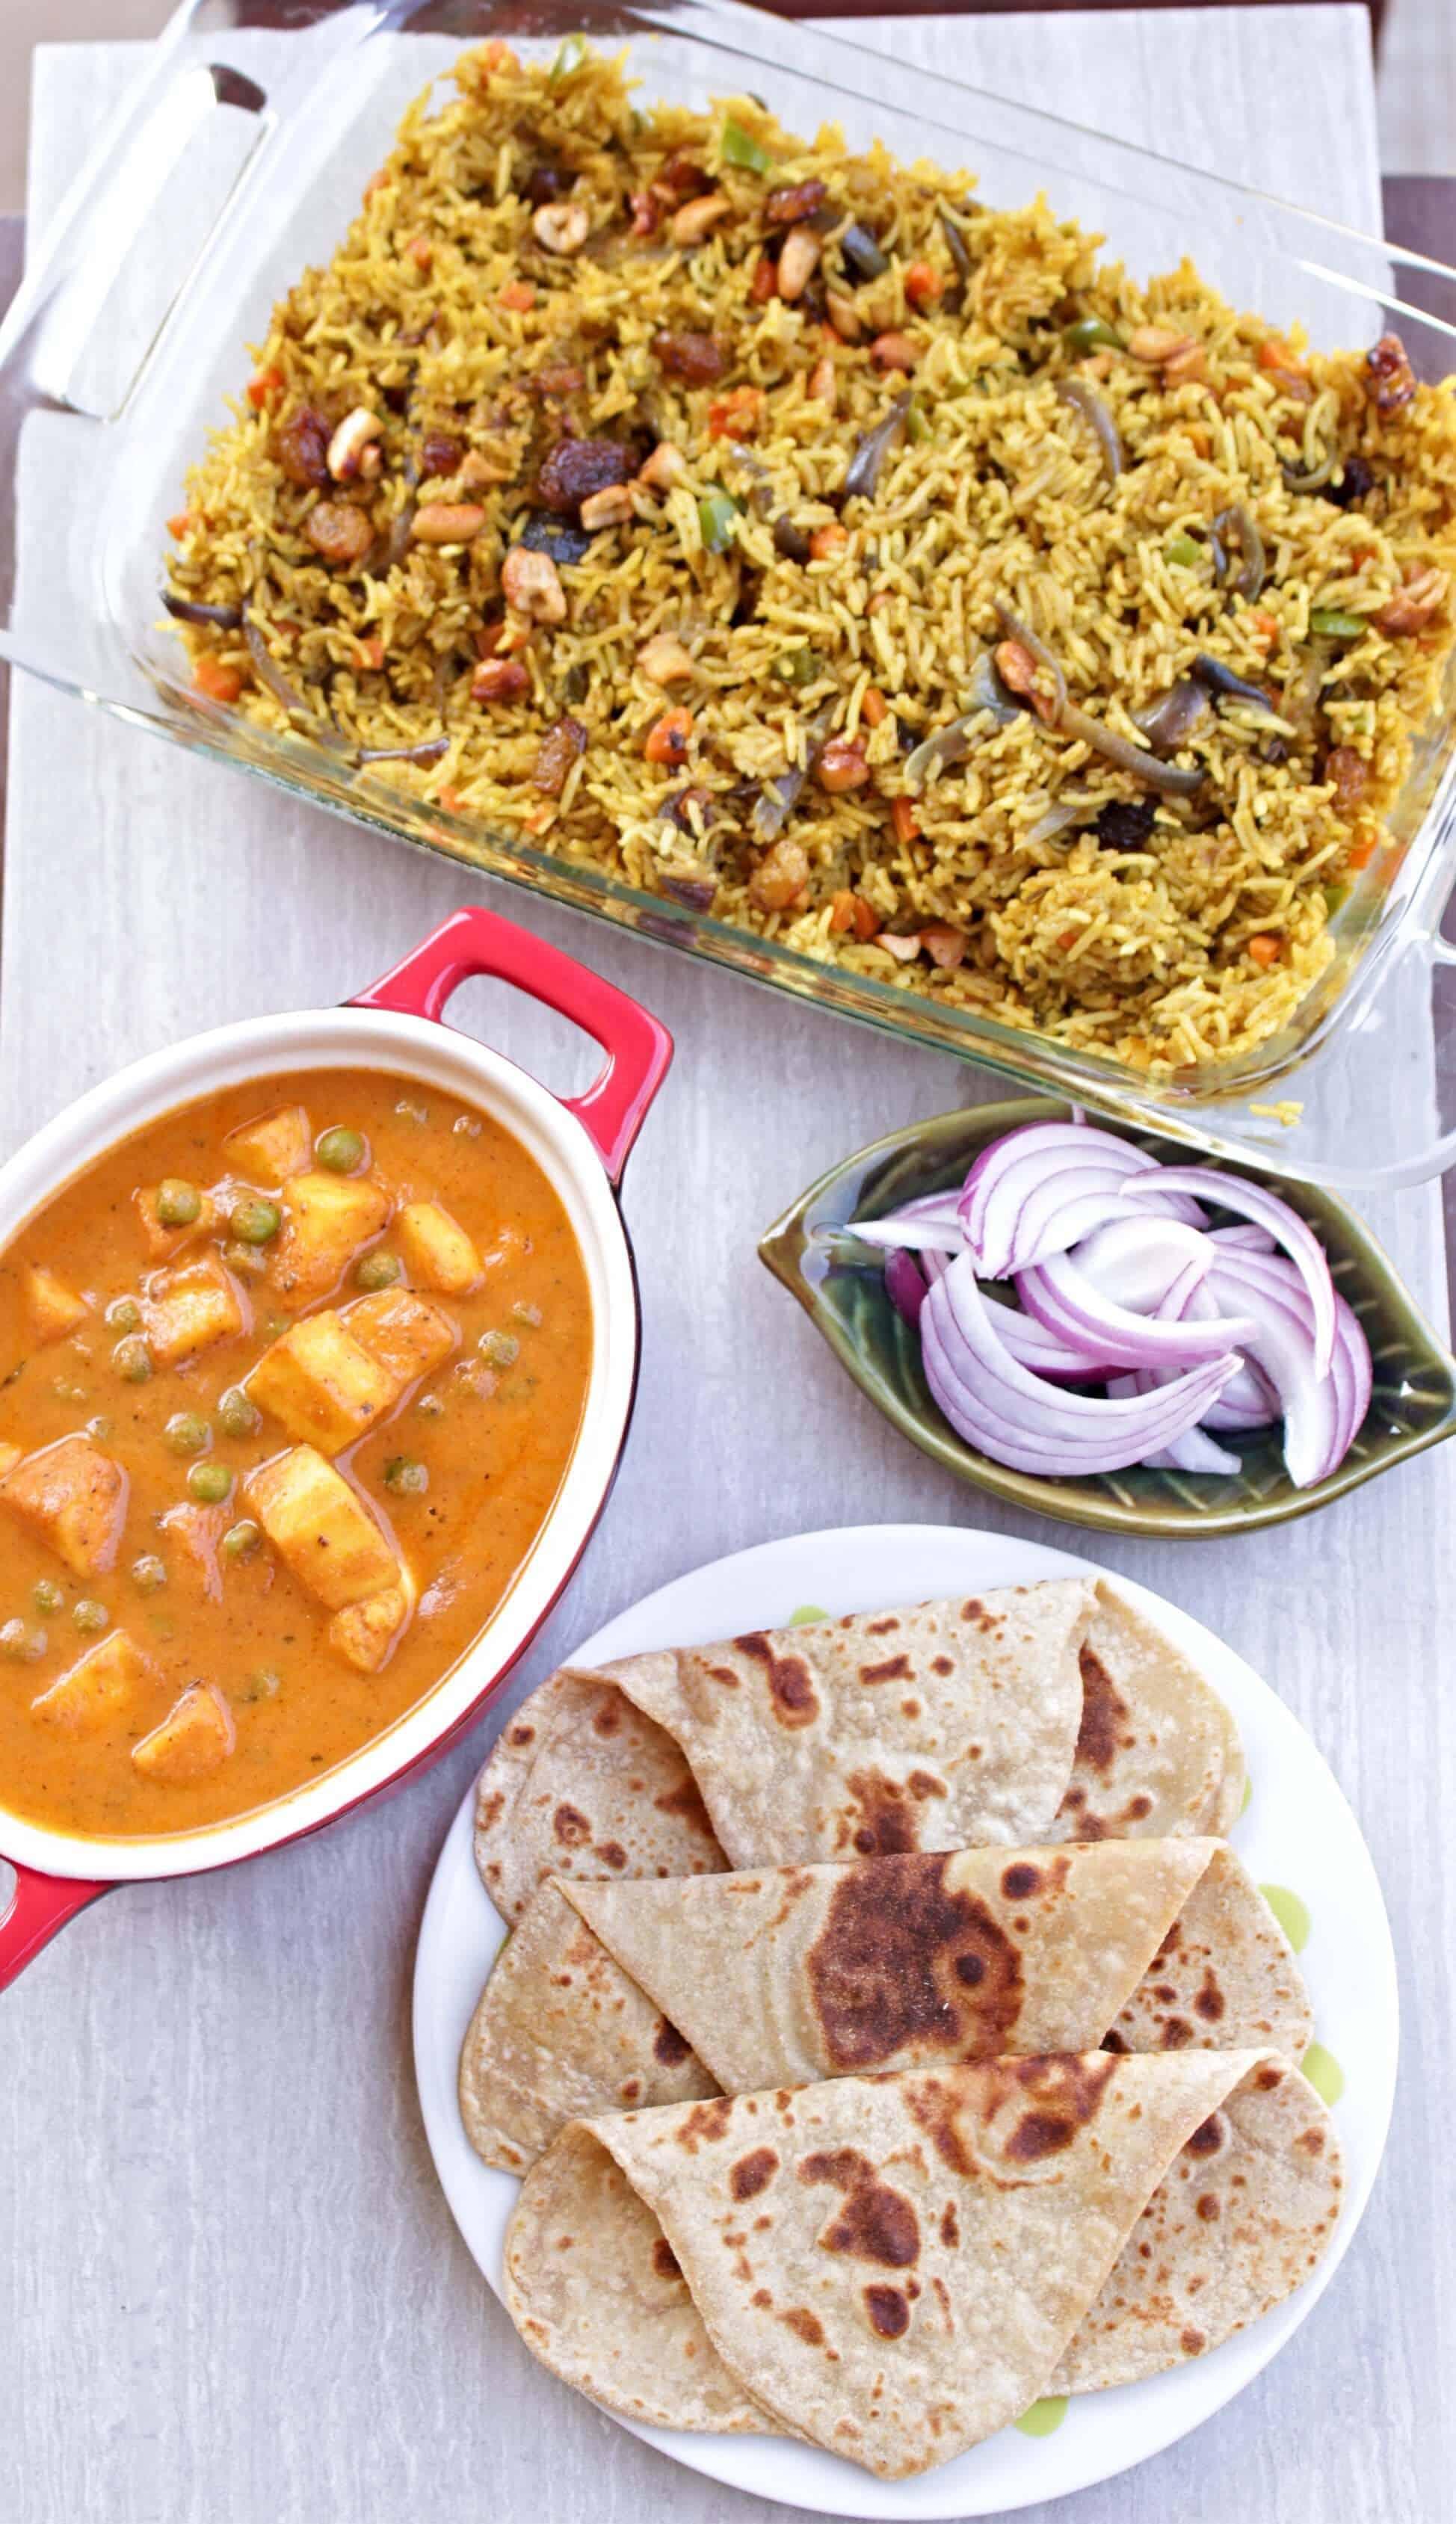 Simple Vegetable Biriyani with matar paneer and avocado paratha